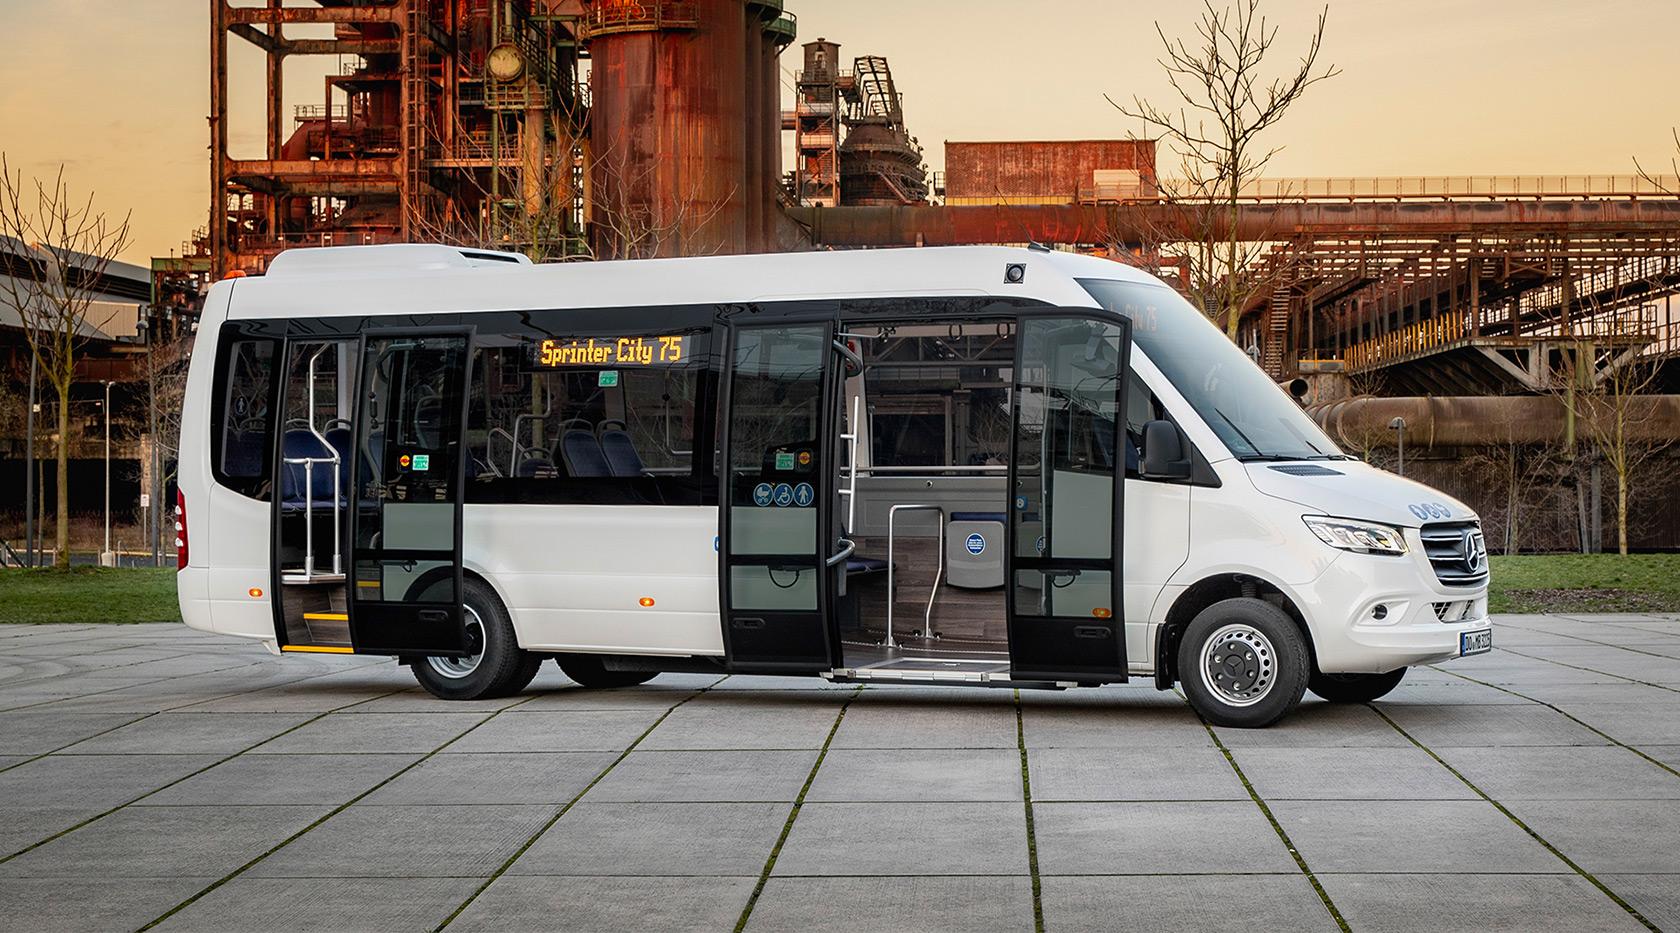 Attualità: Minibus of the Year 2019: Mercedes-Benz Sprinter City 75 – Mercedes-Benz Autobus